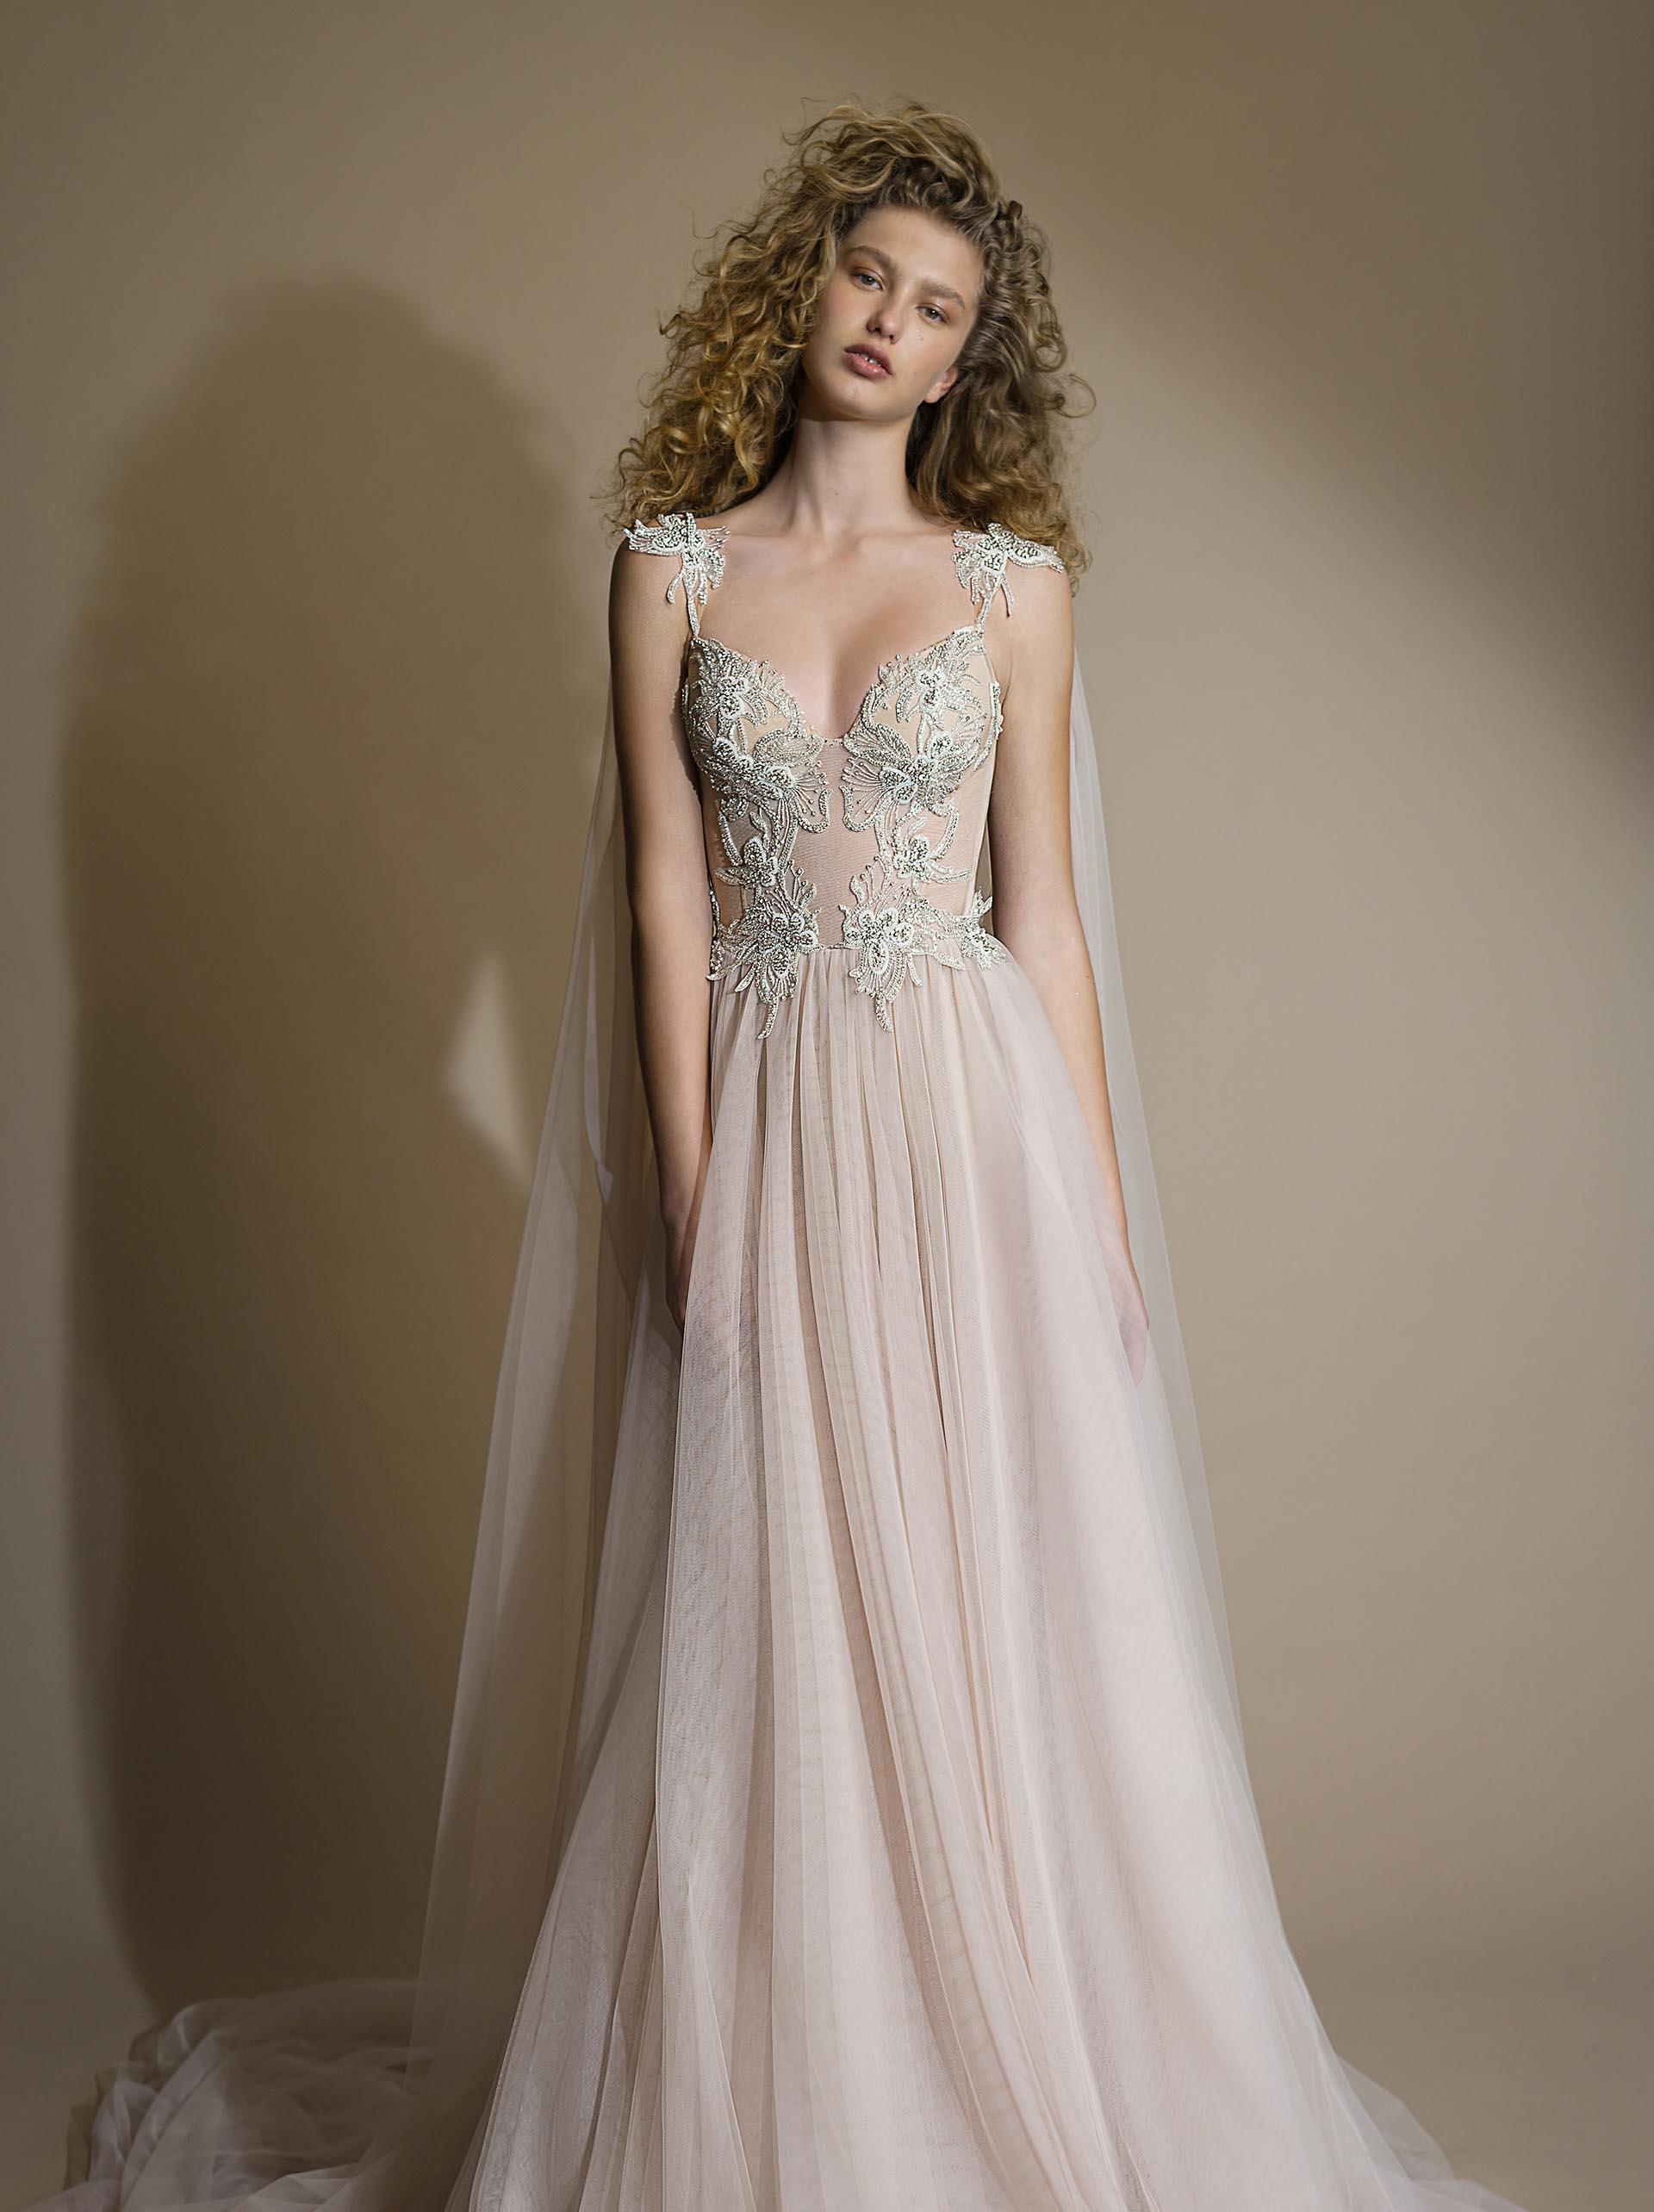 Gala G - 111 beaded corset princess tull ballgown wedding dress